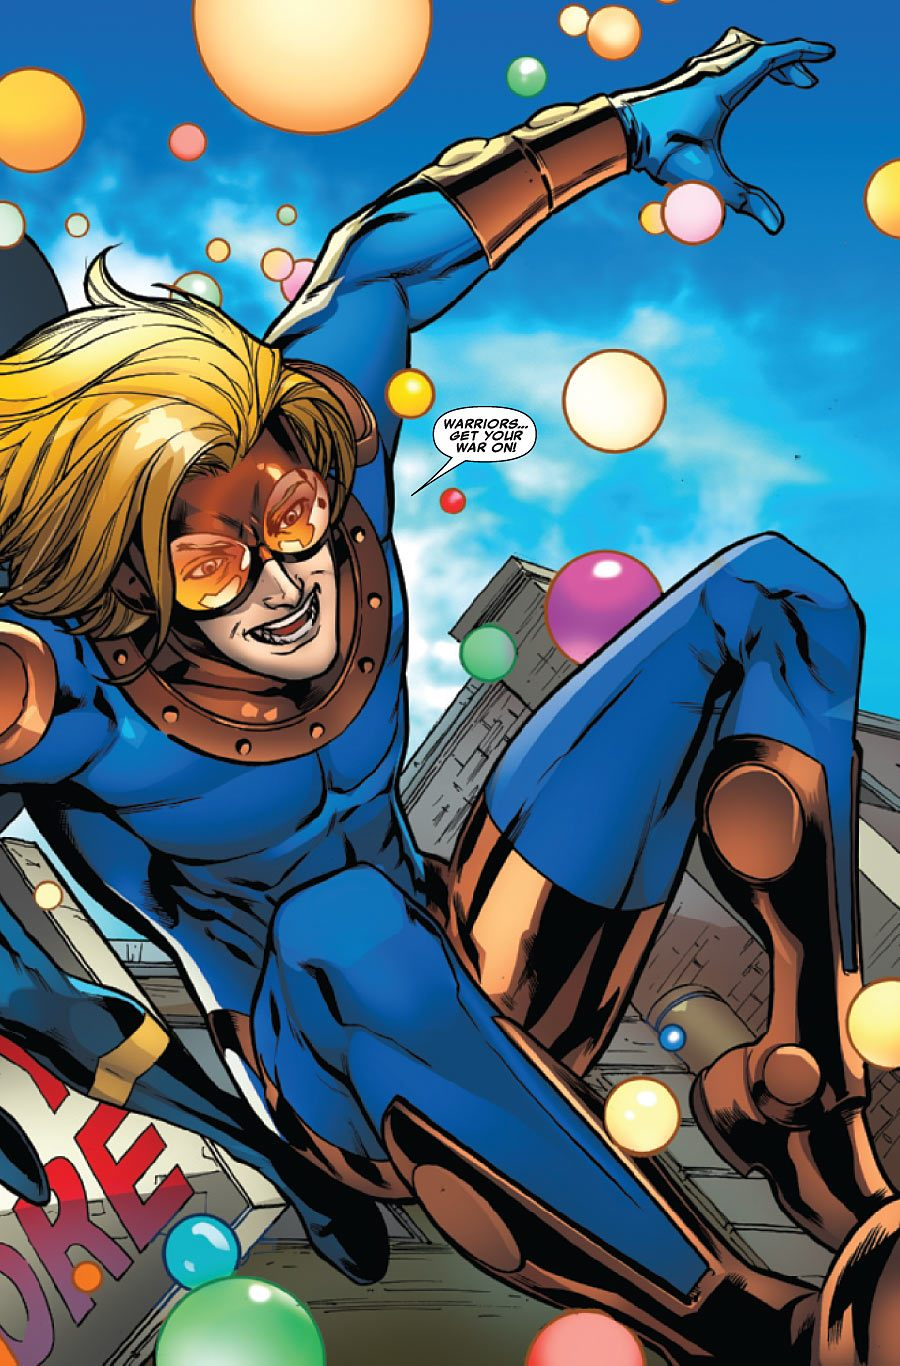 Image du personnage de Marvel Comics, Speedball